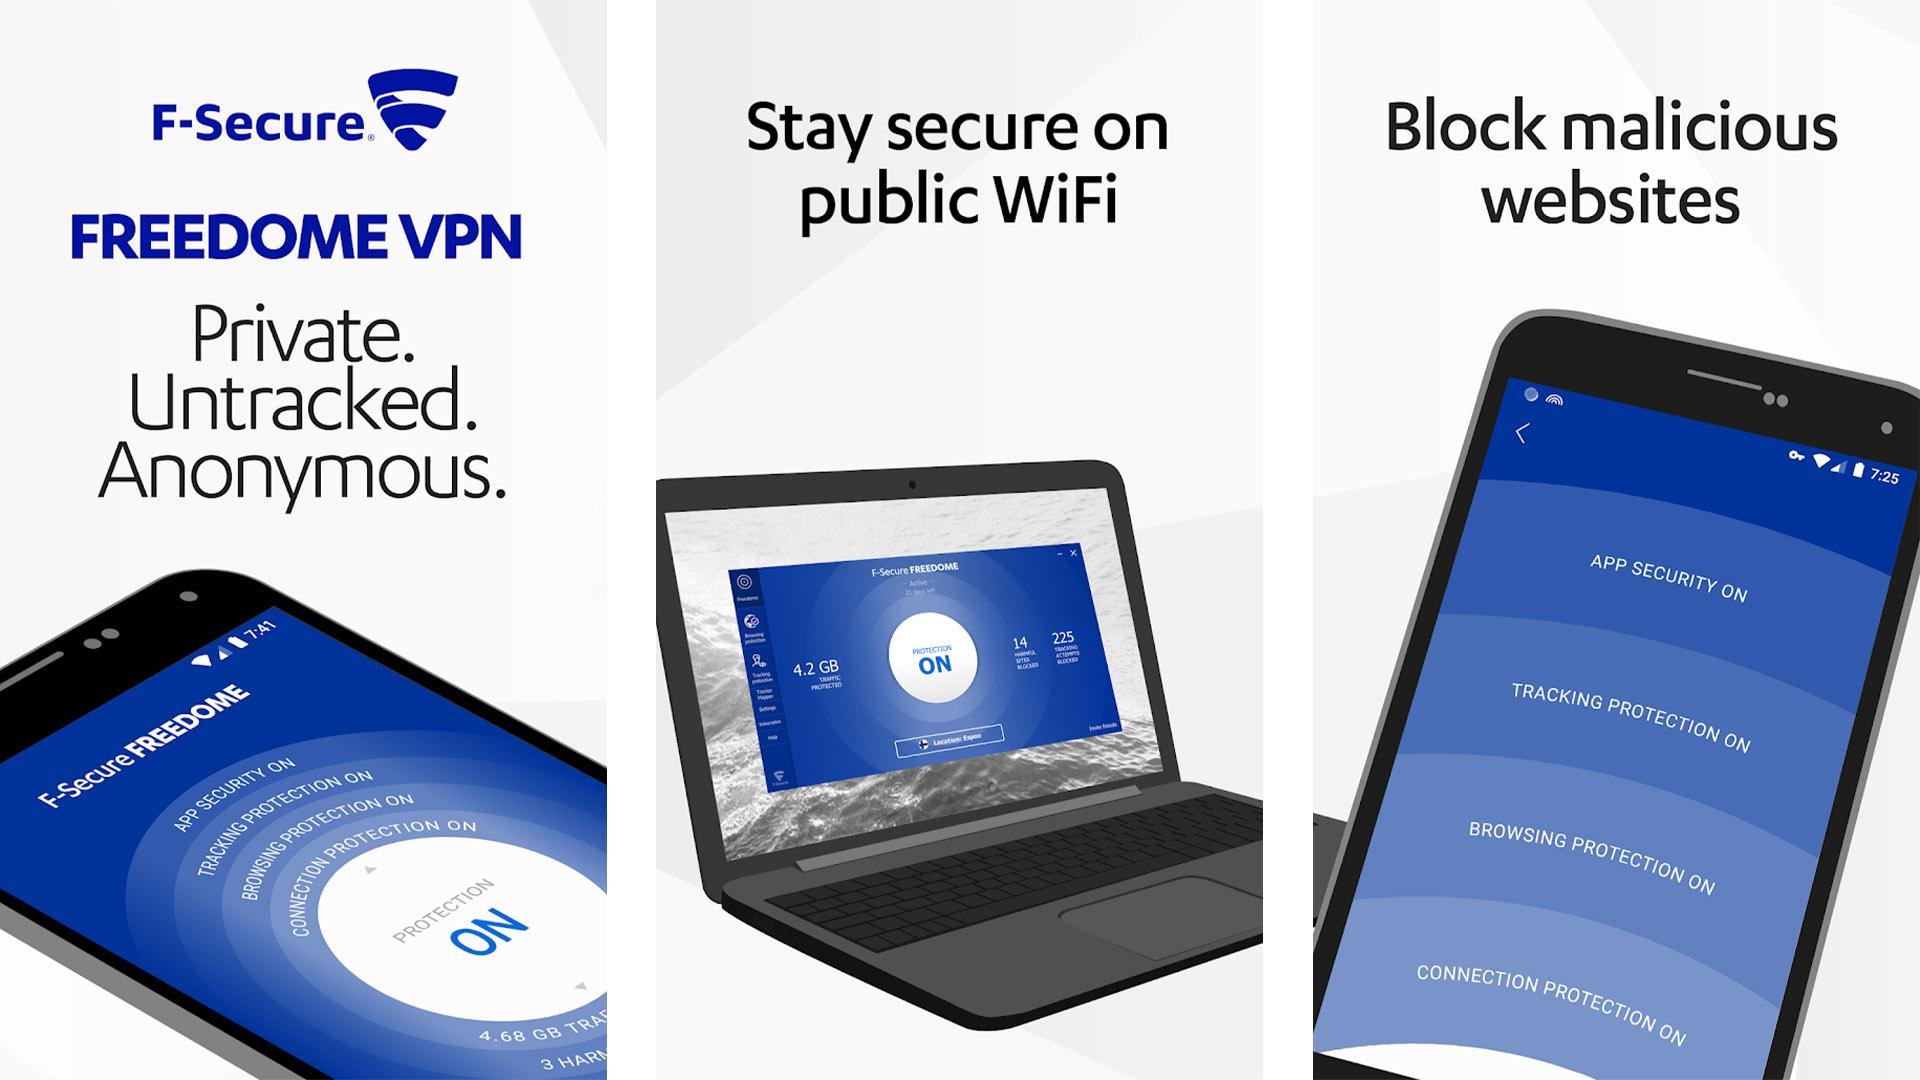 Freedome VPN screenshot 2020